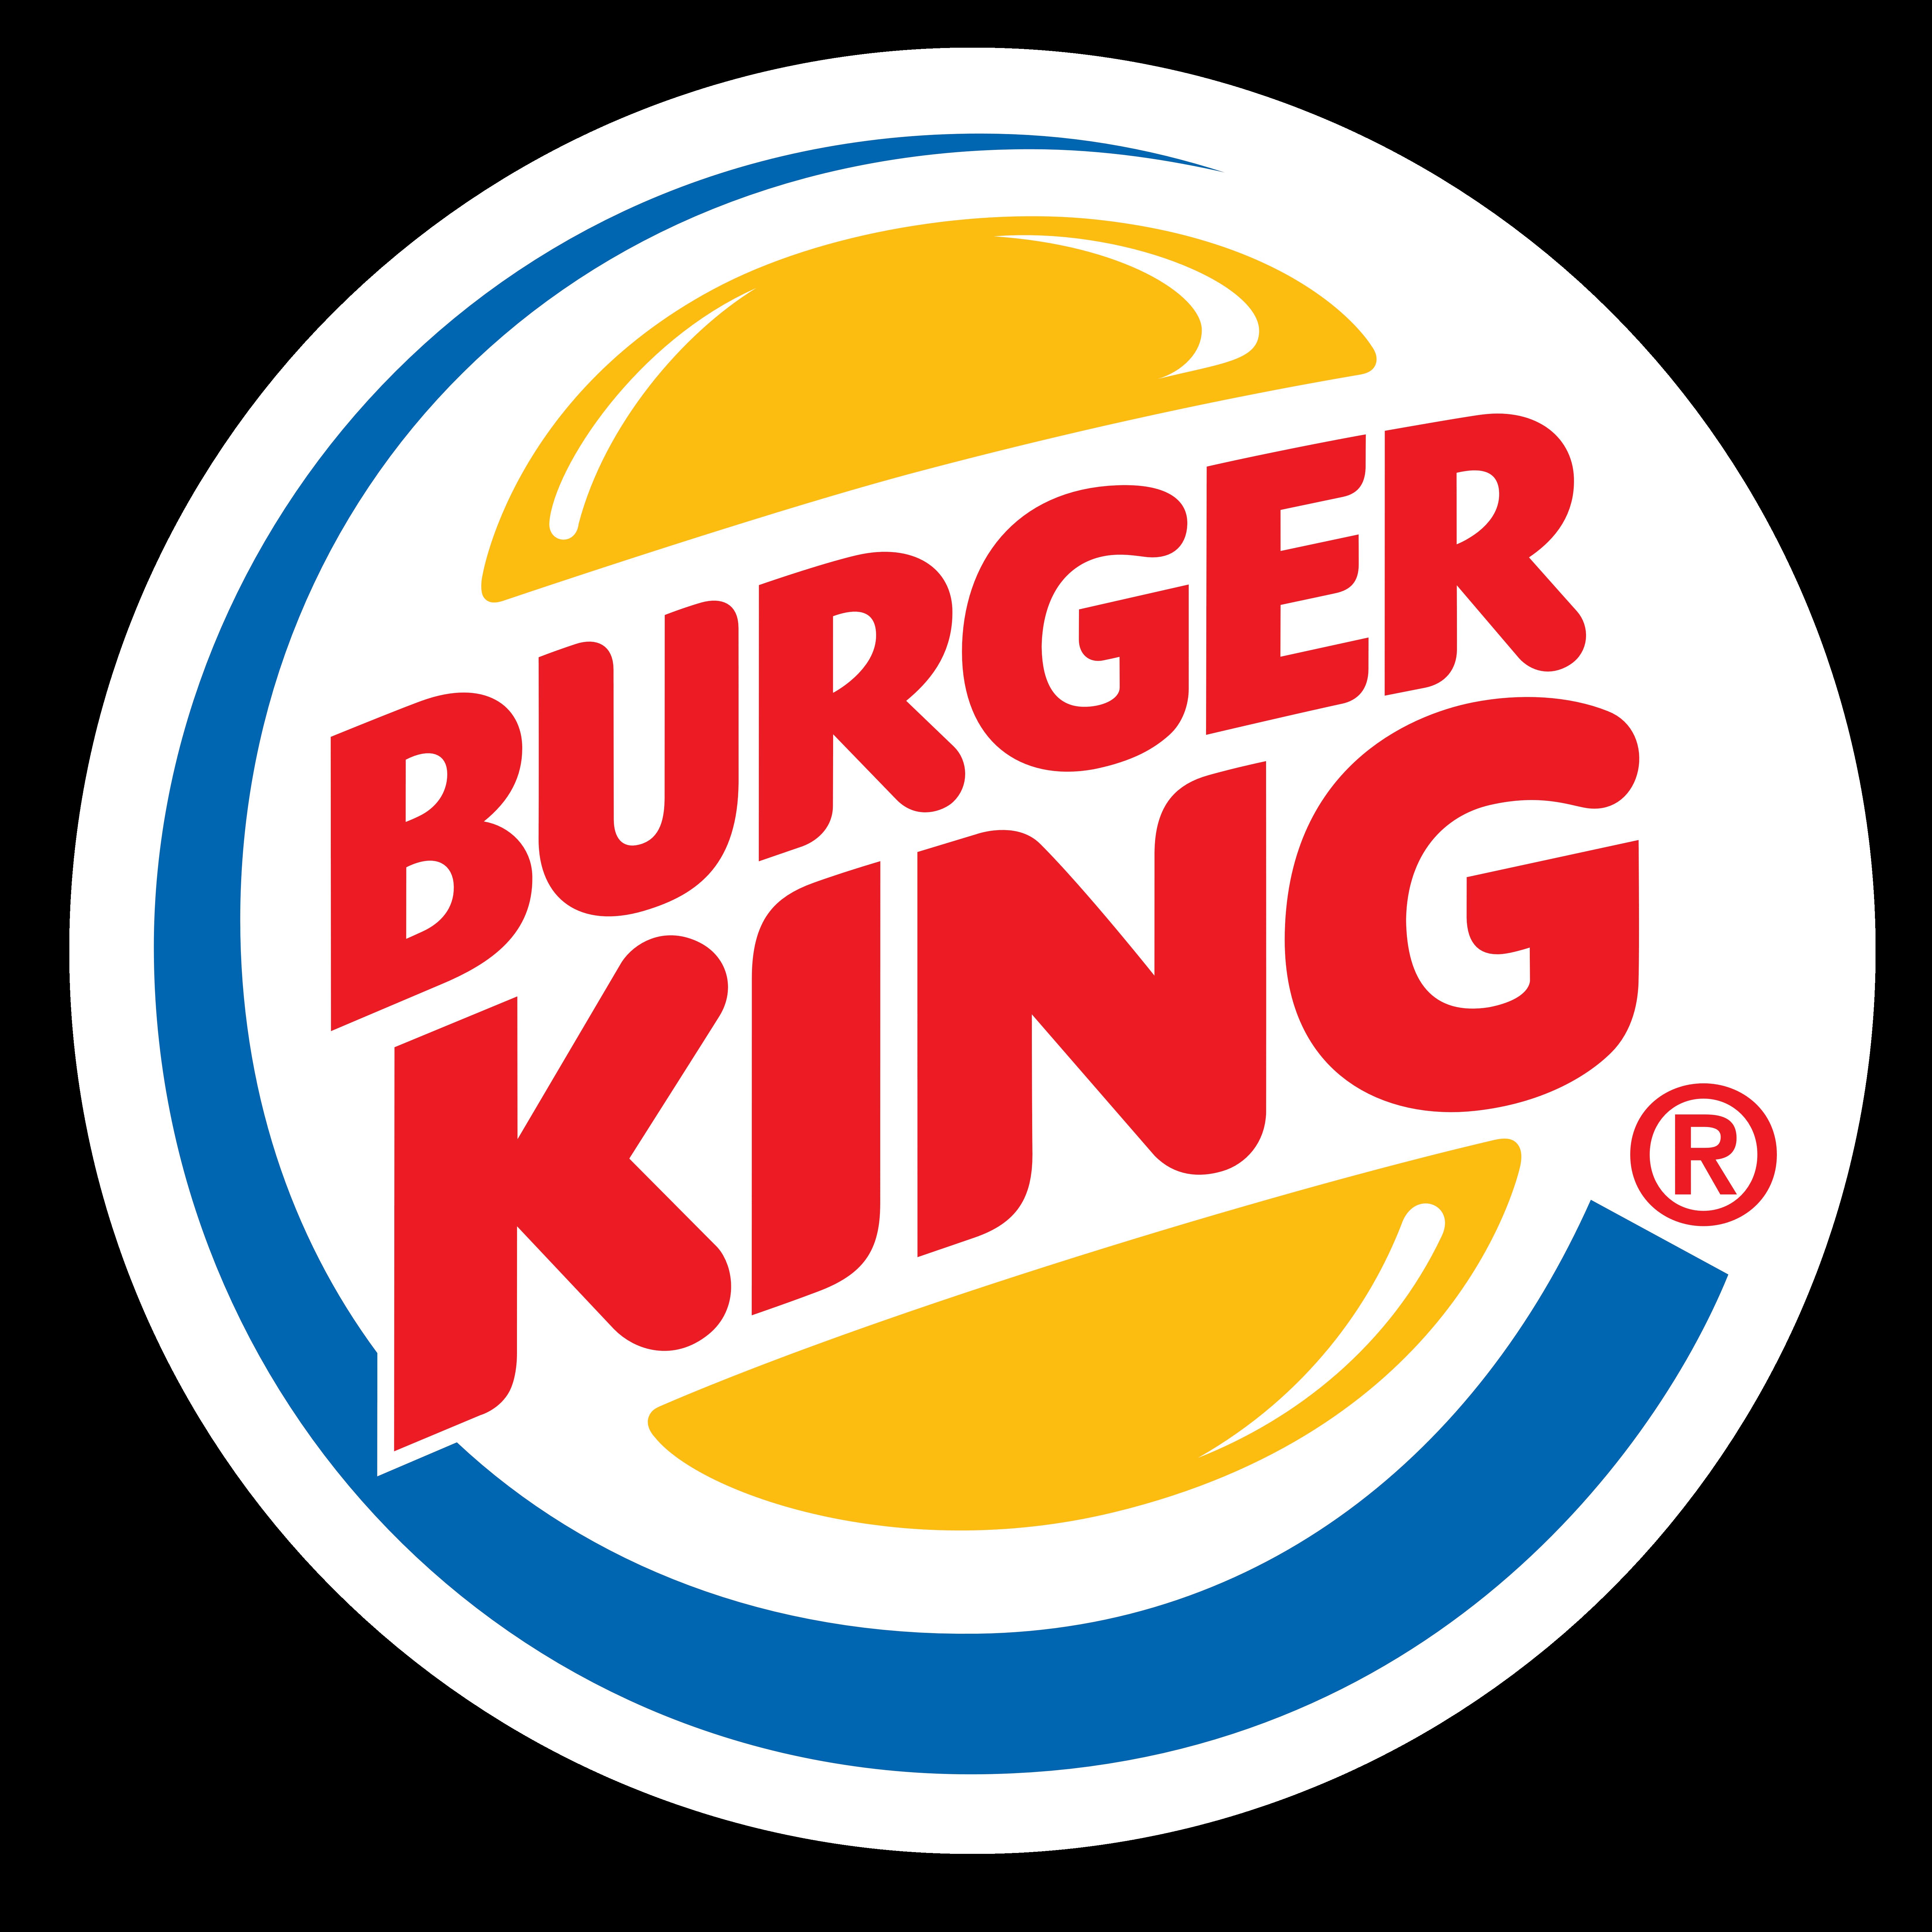 Logo Burger King Png - Logo Burger King Png Hdpng.com 6600, Transparent background PNG HD thumbnail